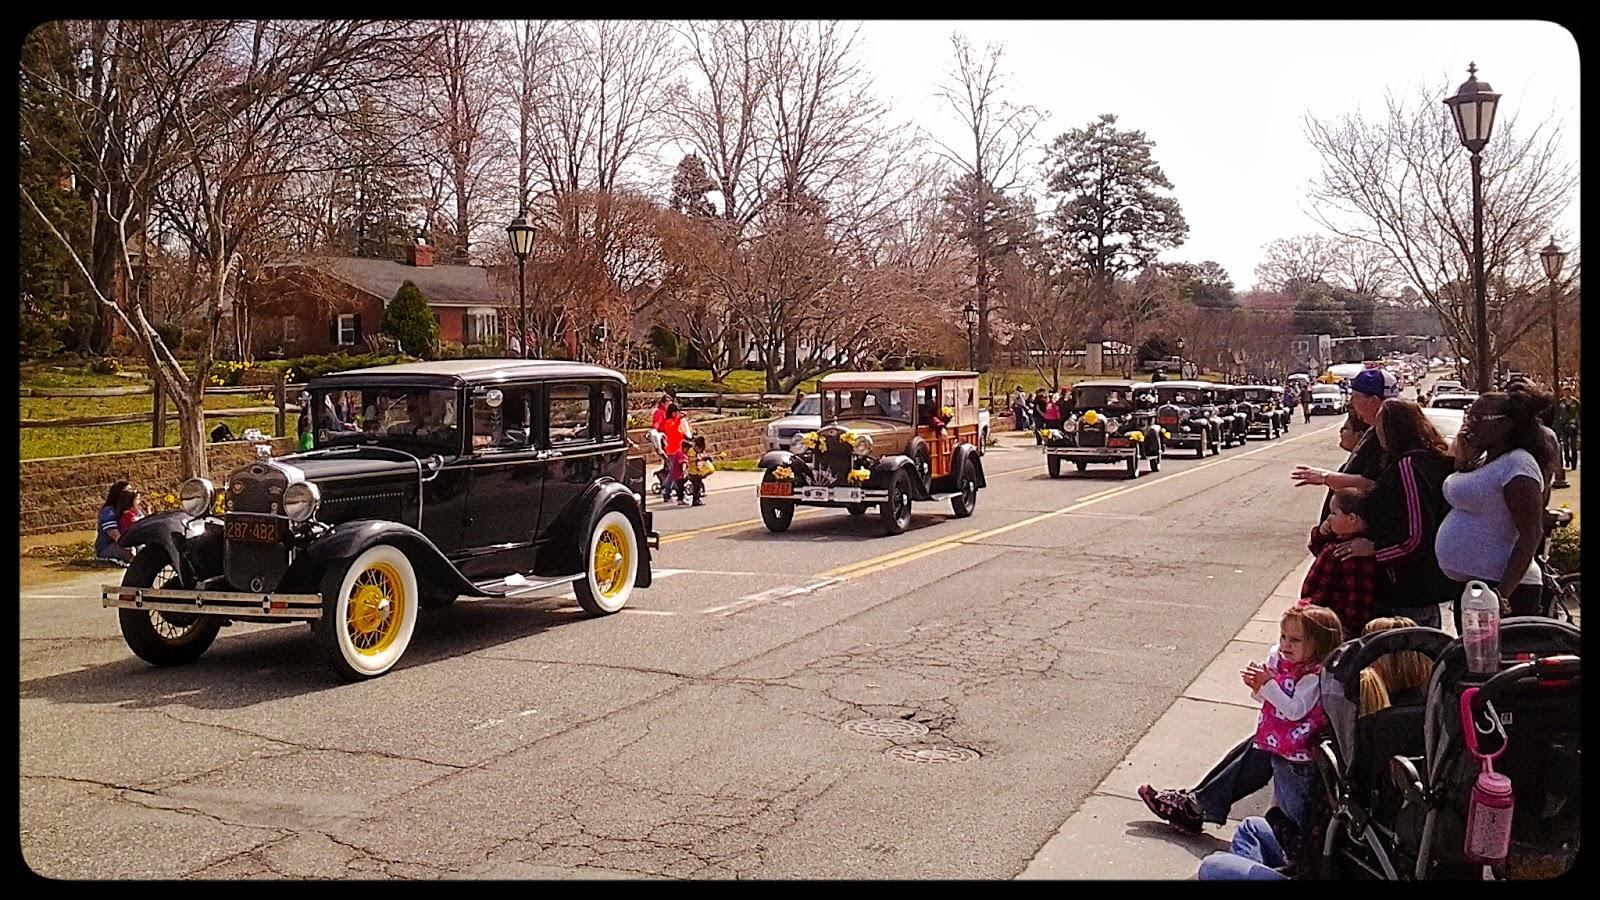 Parade at 28th Annual Gloucester Daffodil Festival via foobella.blogspot.com